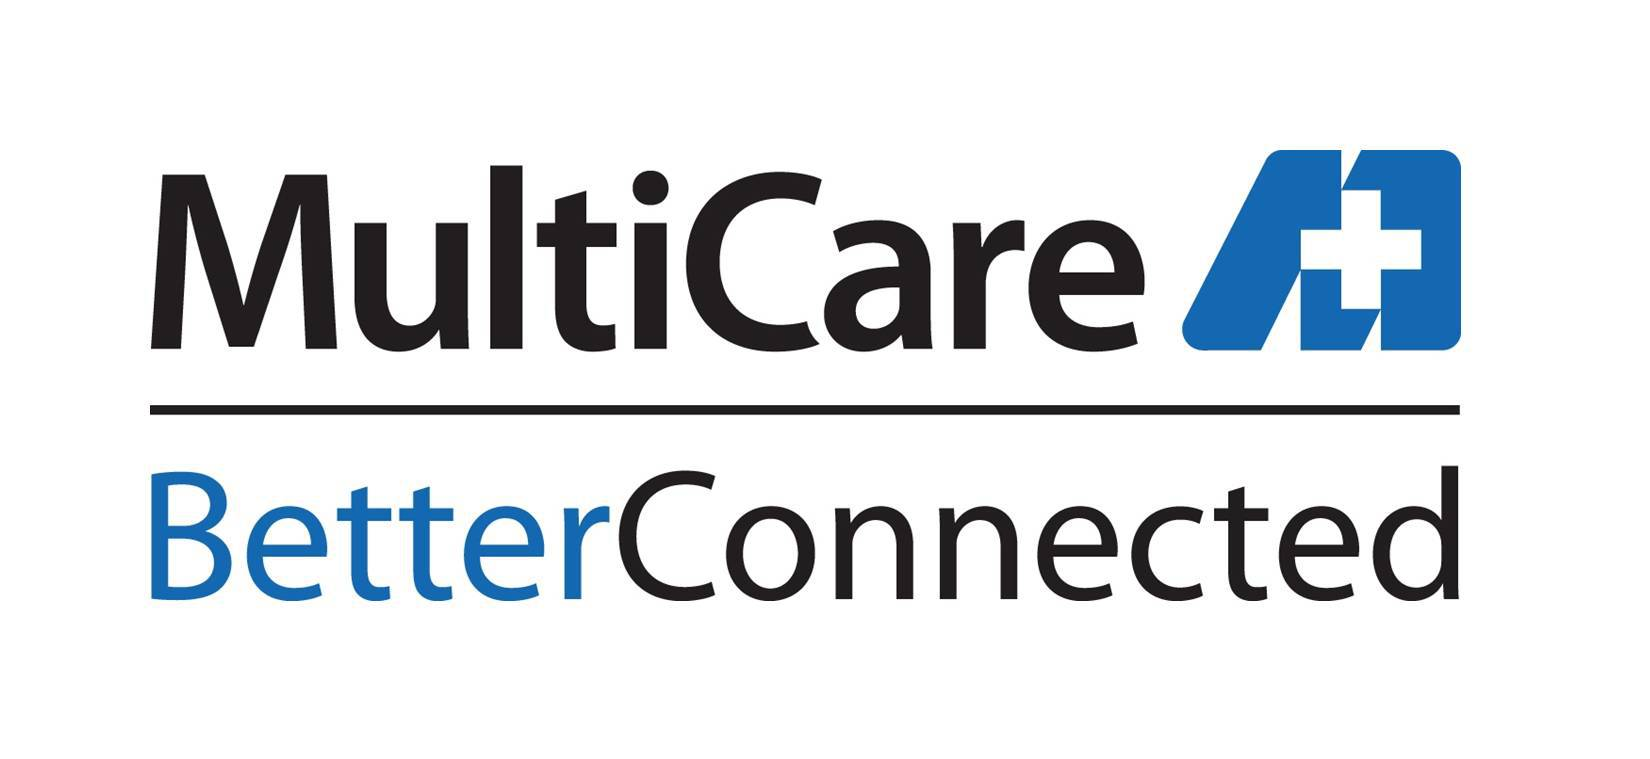 https://growthzonesitesprod.azureedge.net/wp-content/uploads/sites/937/2021/04/Multicare-Logo-Large.jpg